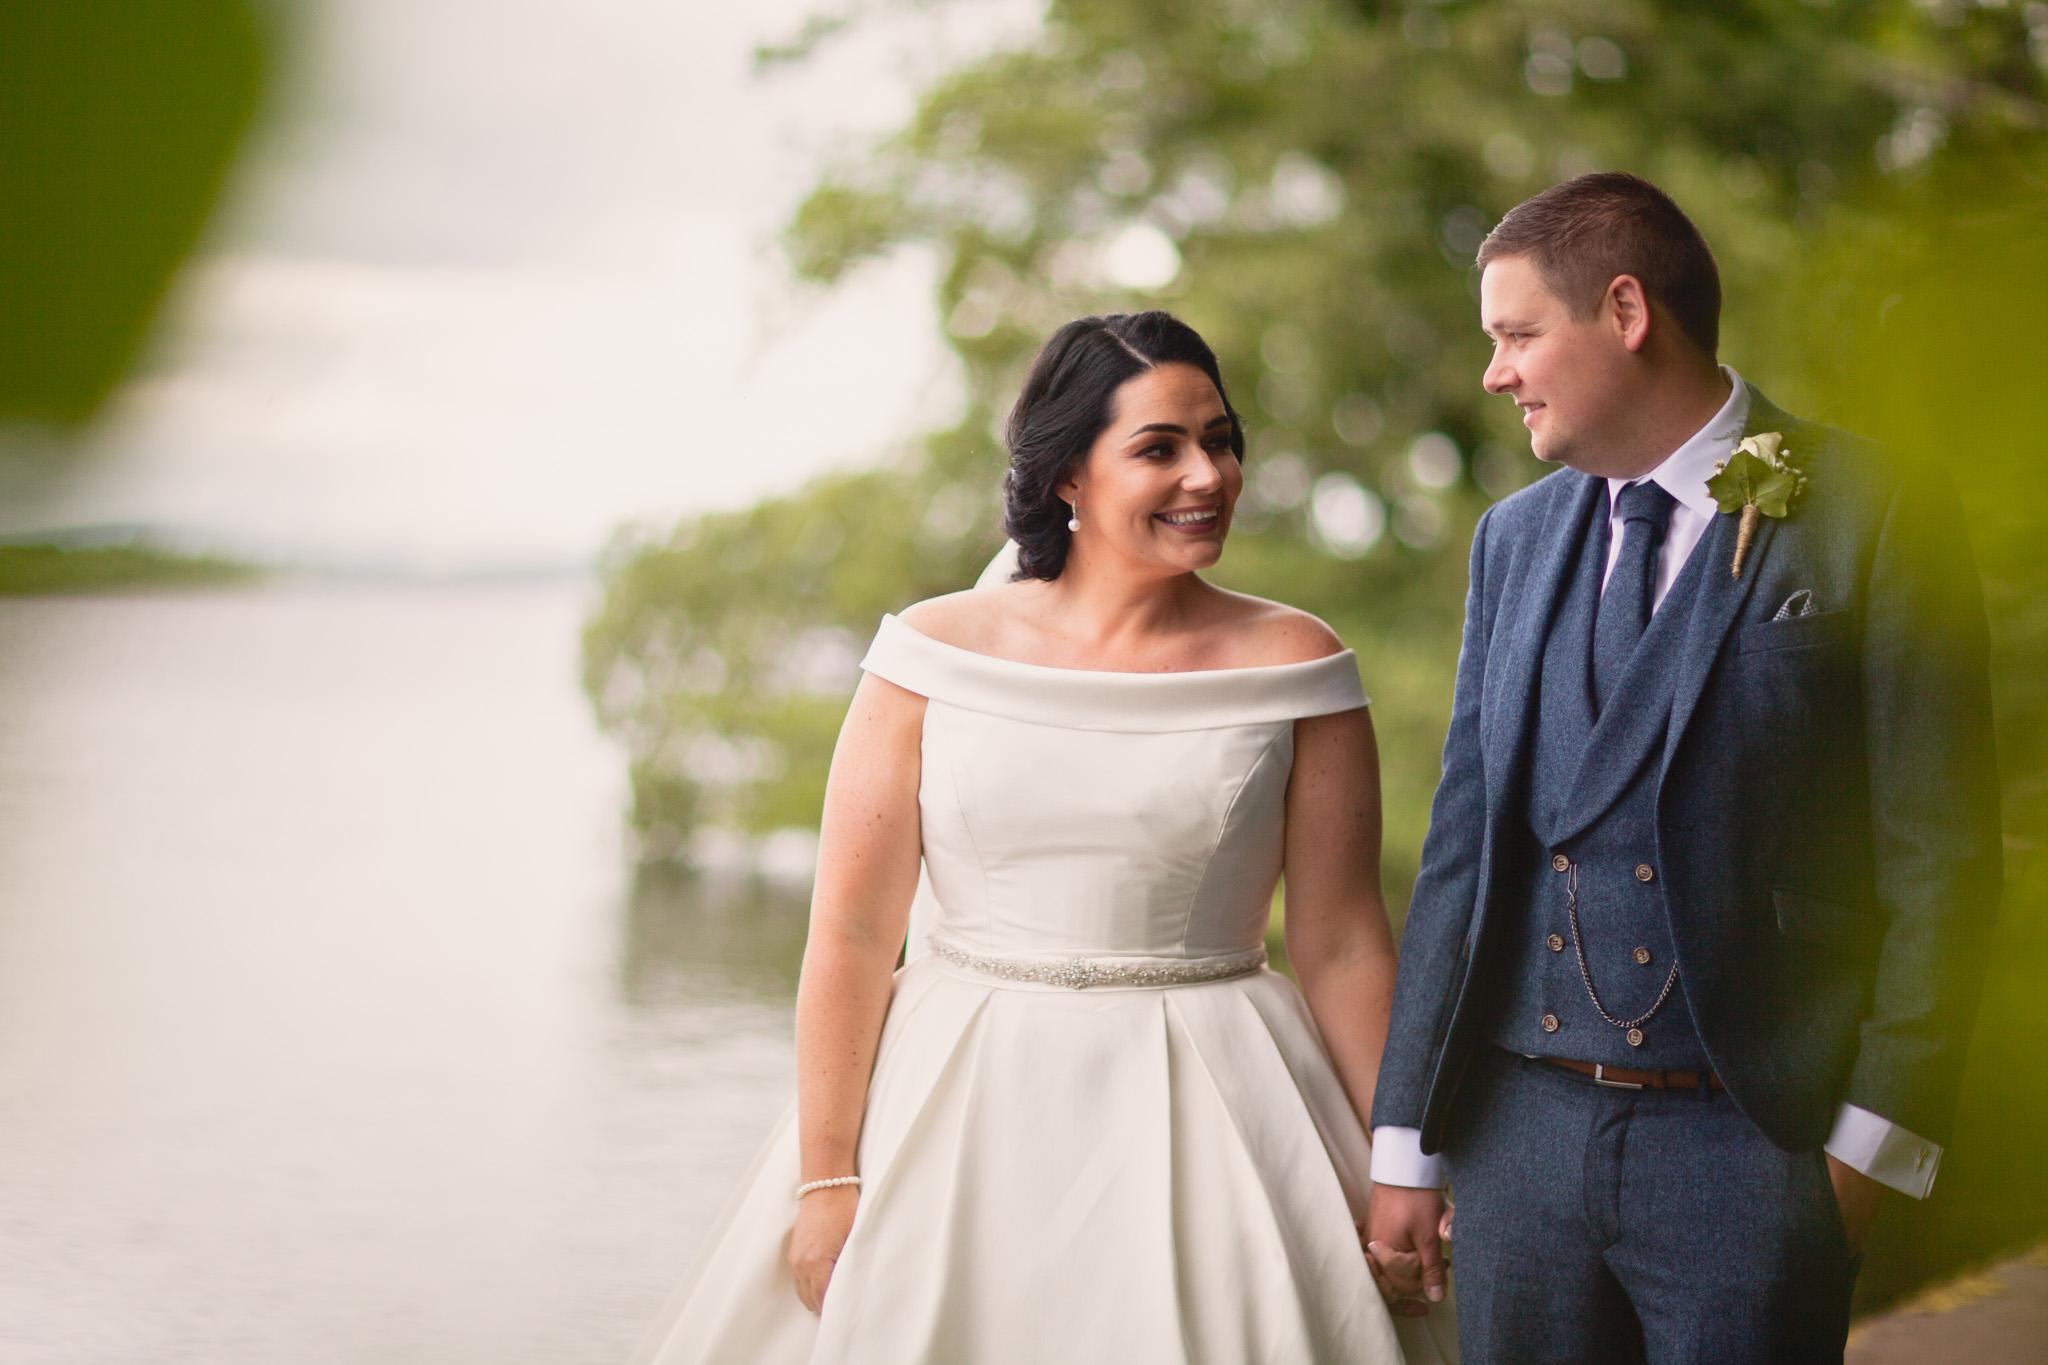 Mark_Barnes_Northern_Ireland_Wedding_Photography_Lusty_Beg_Wedding_Photography_Hayley&Brian-29.jpg